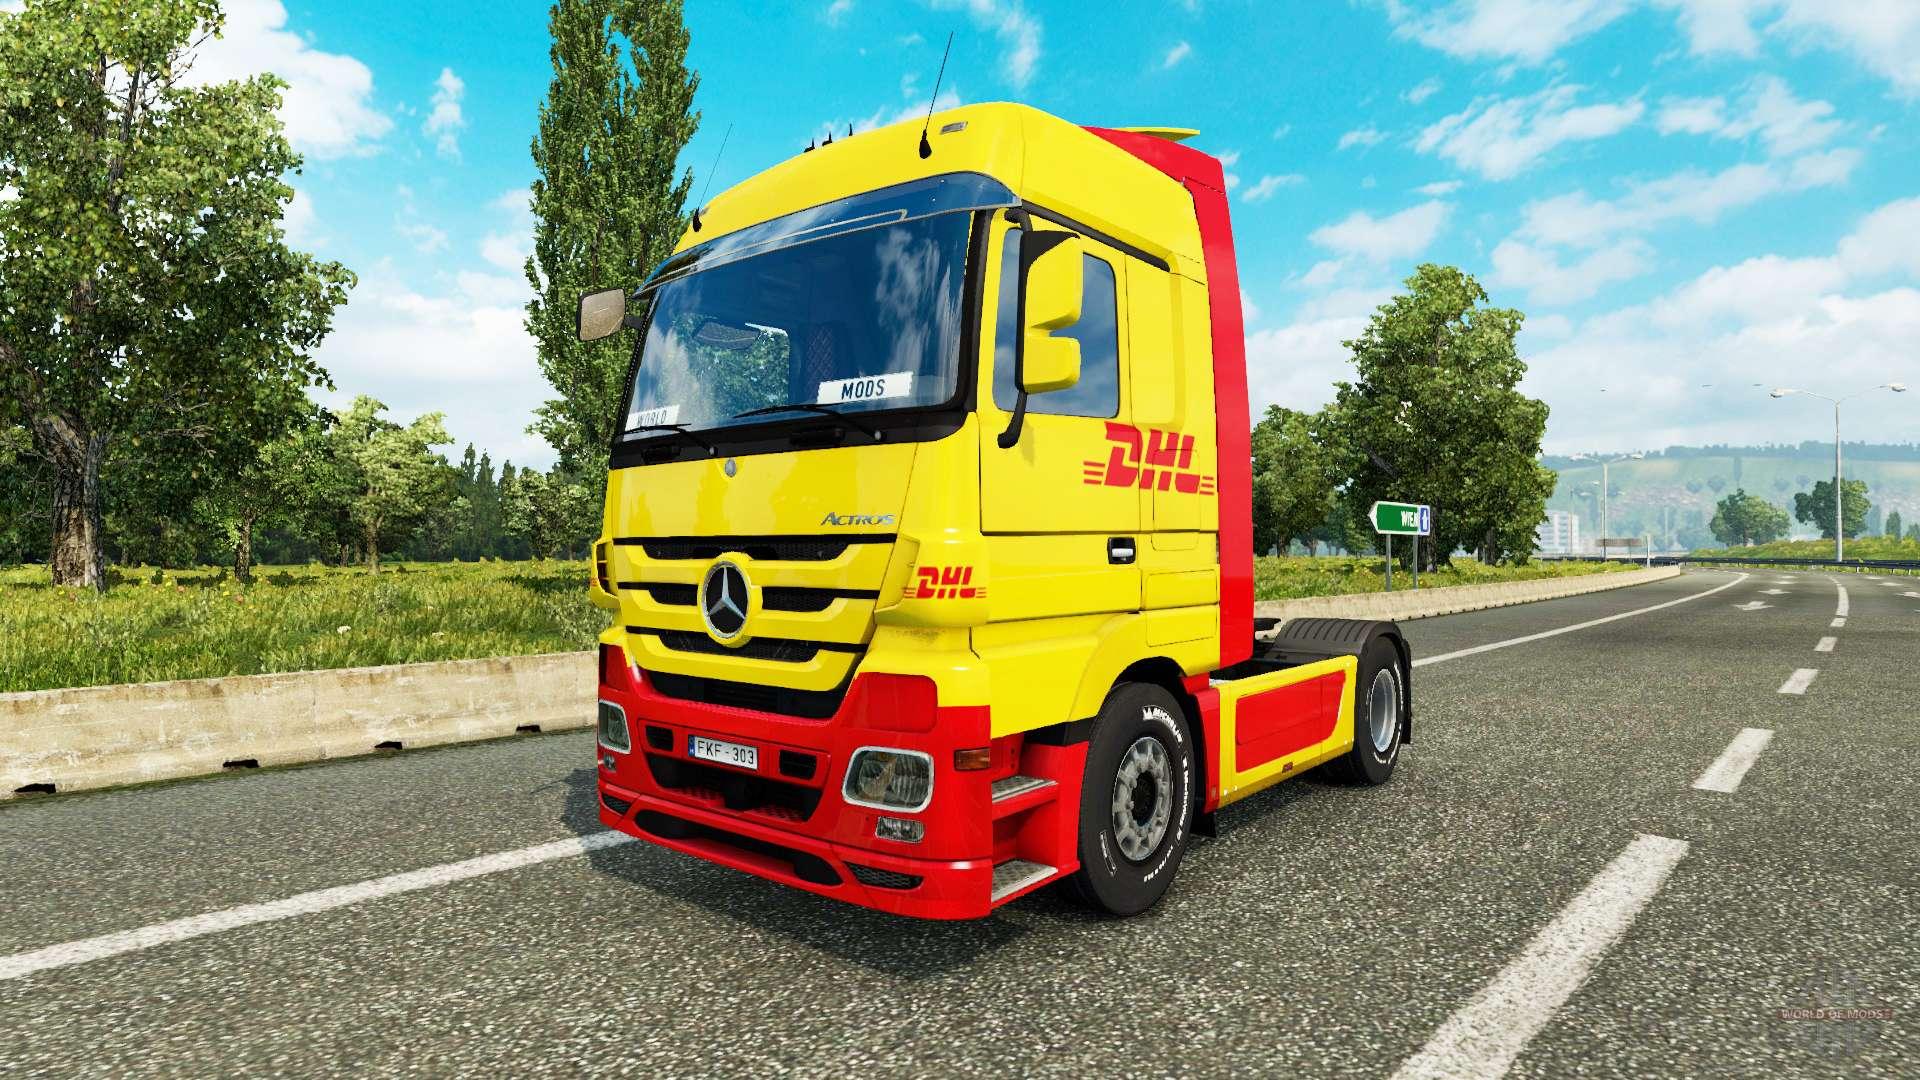 Pele dhl para trator mercedes benz para euro truck simulator 2 for Mercedes benz euro